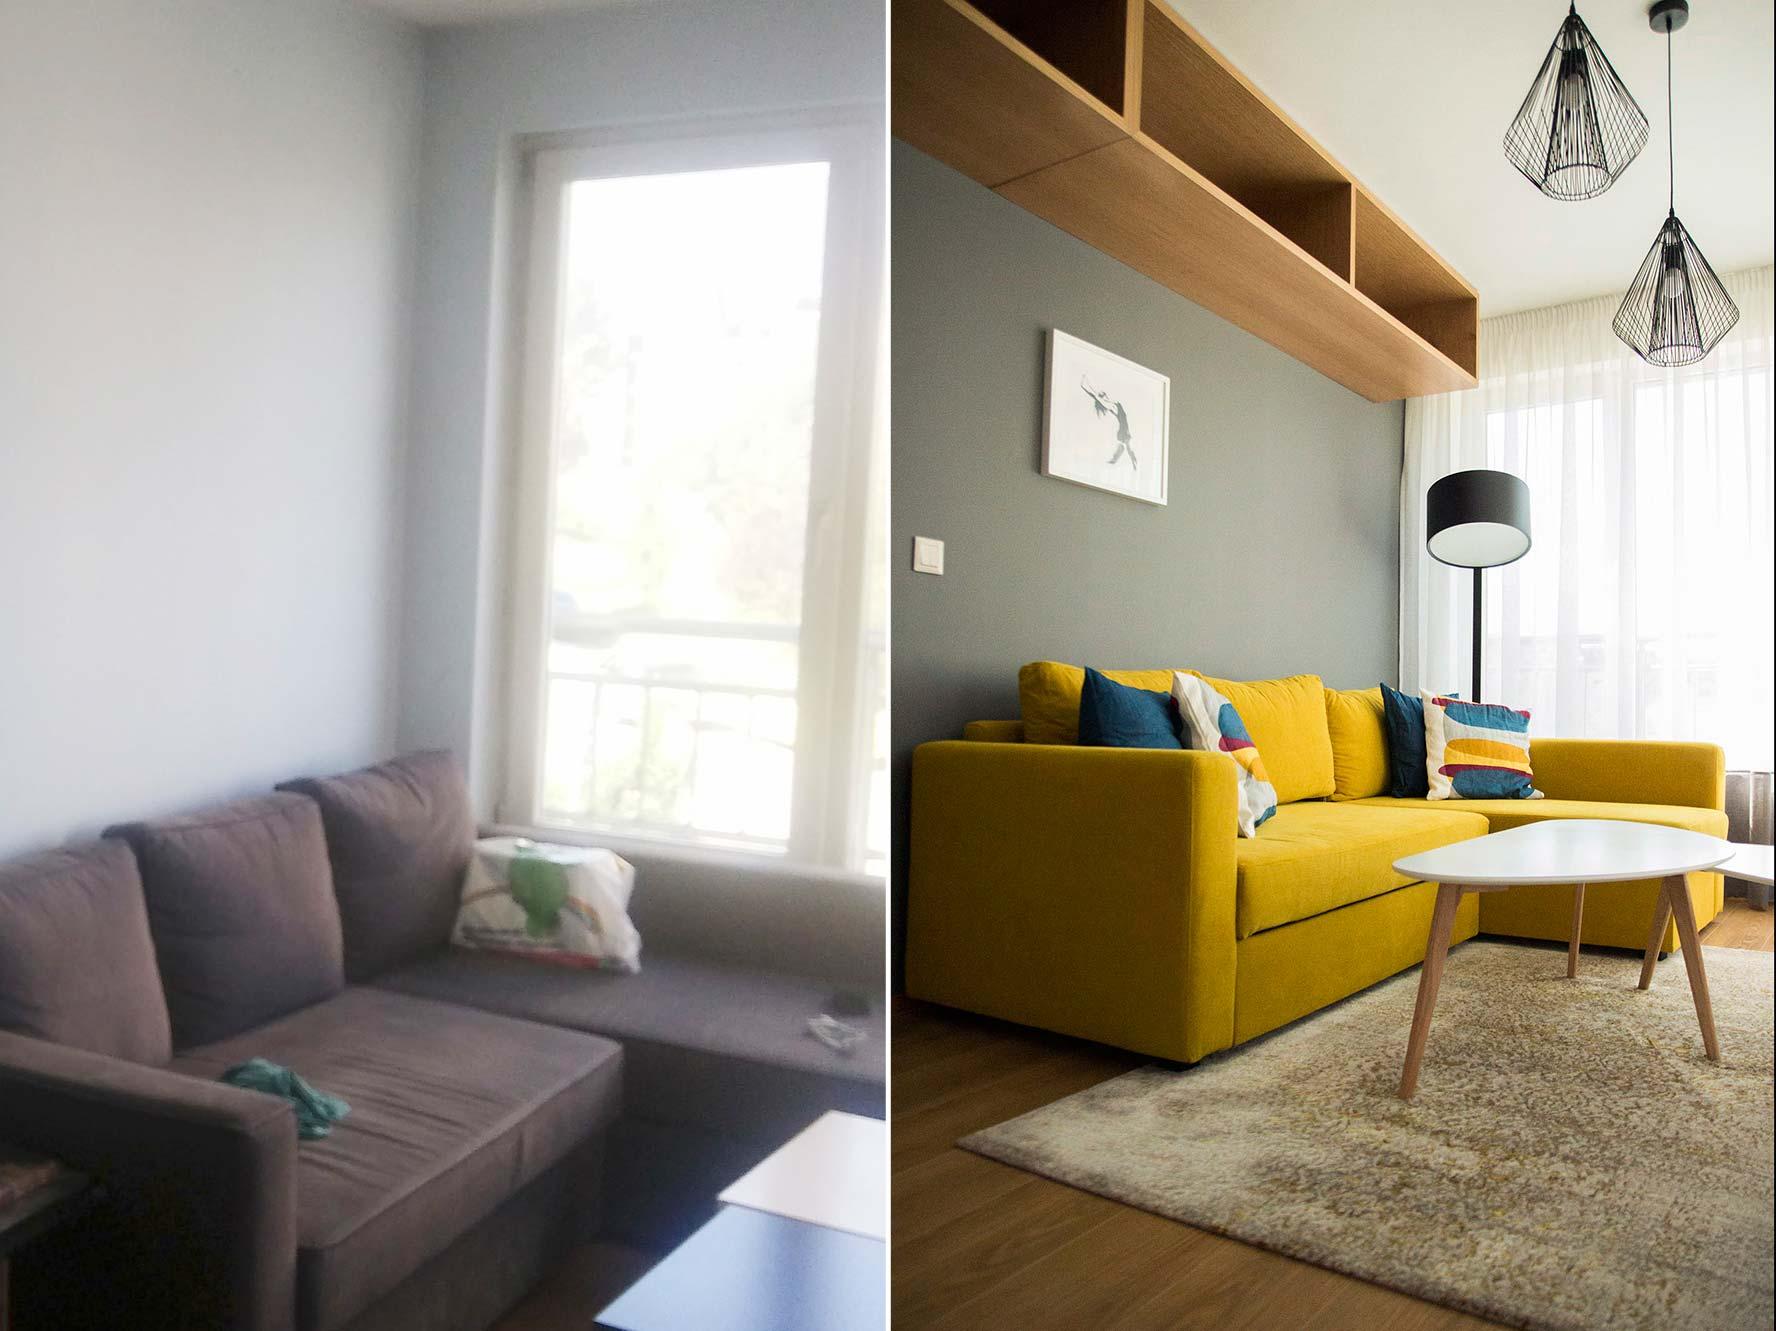 ремонт, реновация и обзавеждане на апартамент в студентски град - Rinnovation